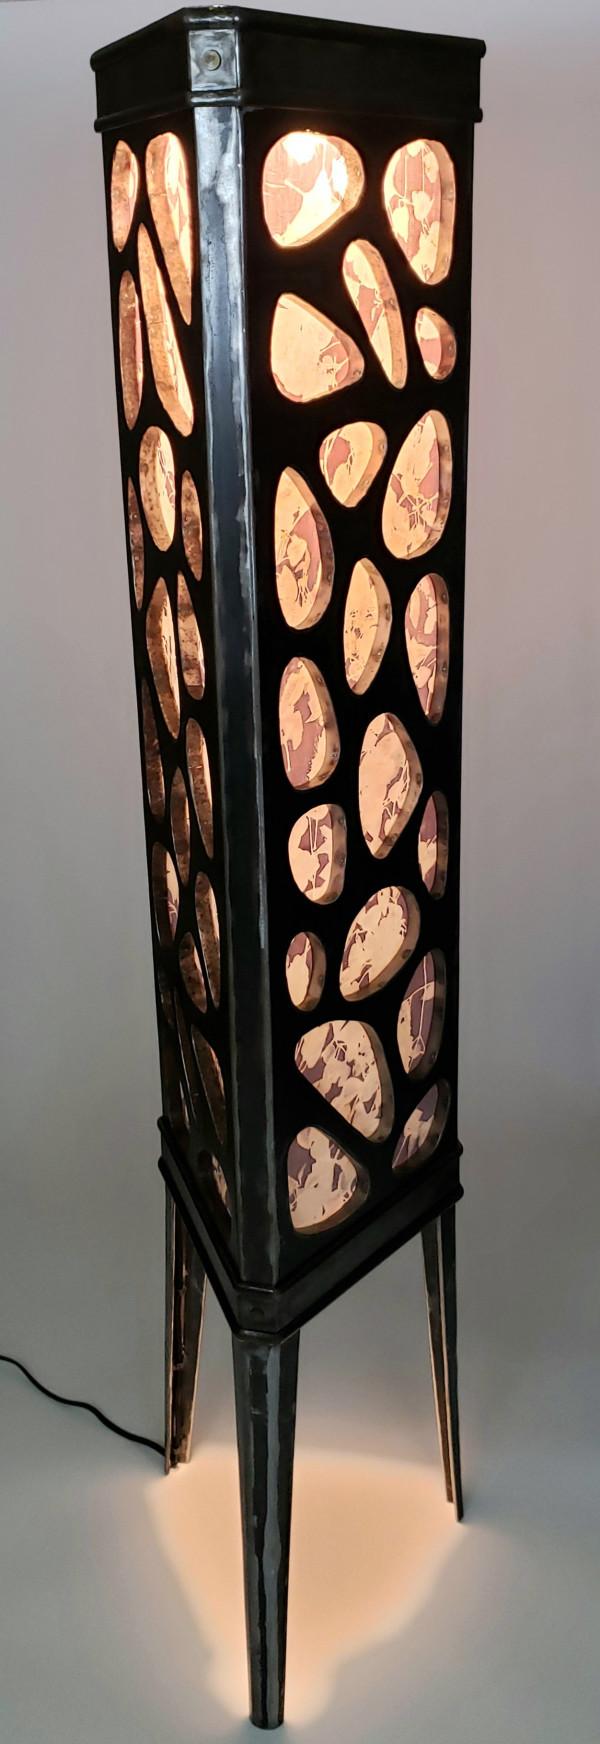 Cobblestone Iron + Eco Printed Silk Sculpture by Michael Stelzer X Becky White